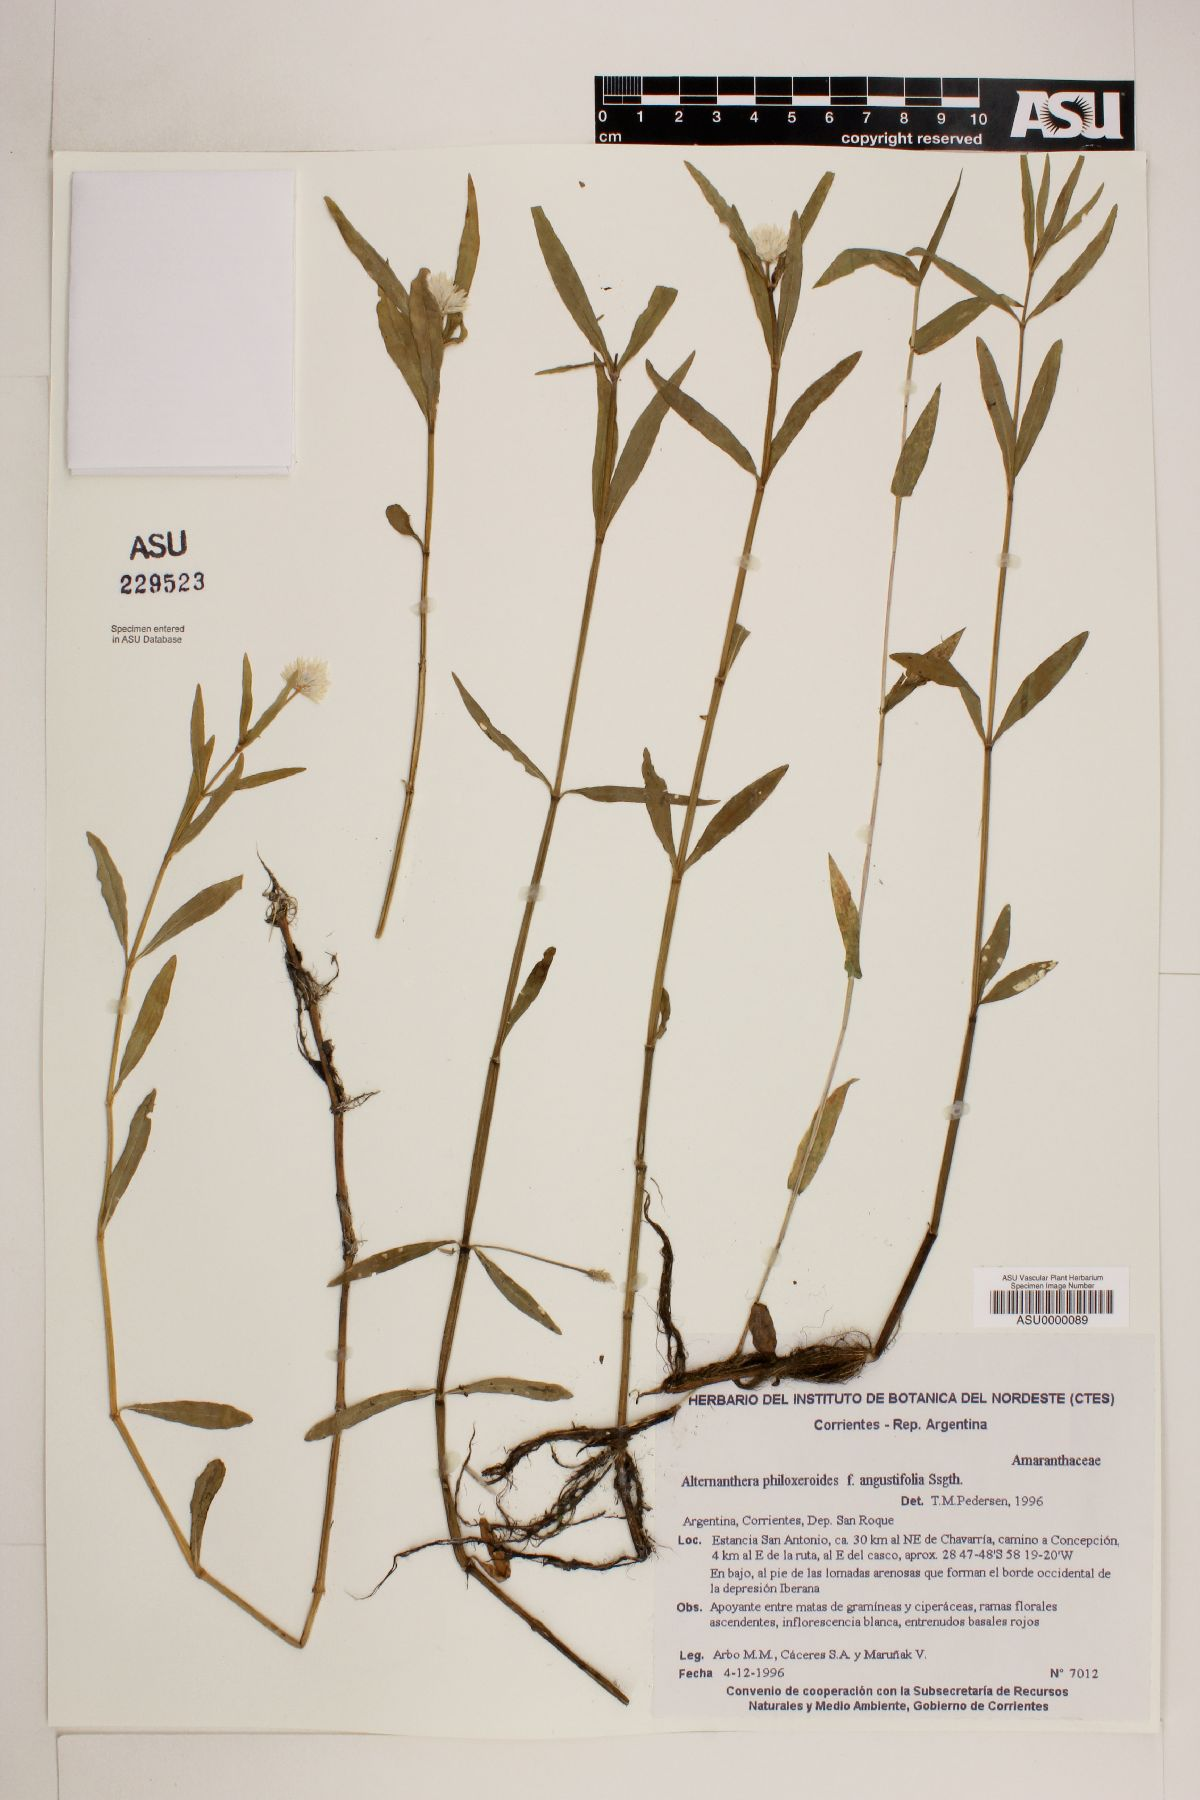 Alternanthera philoxeroides f. angustifolia image